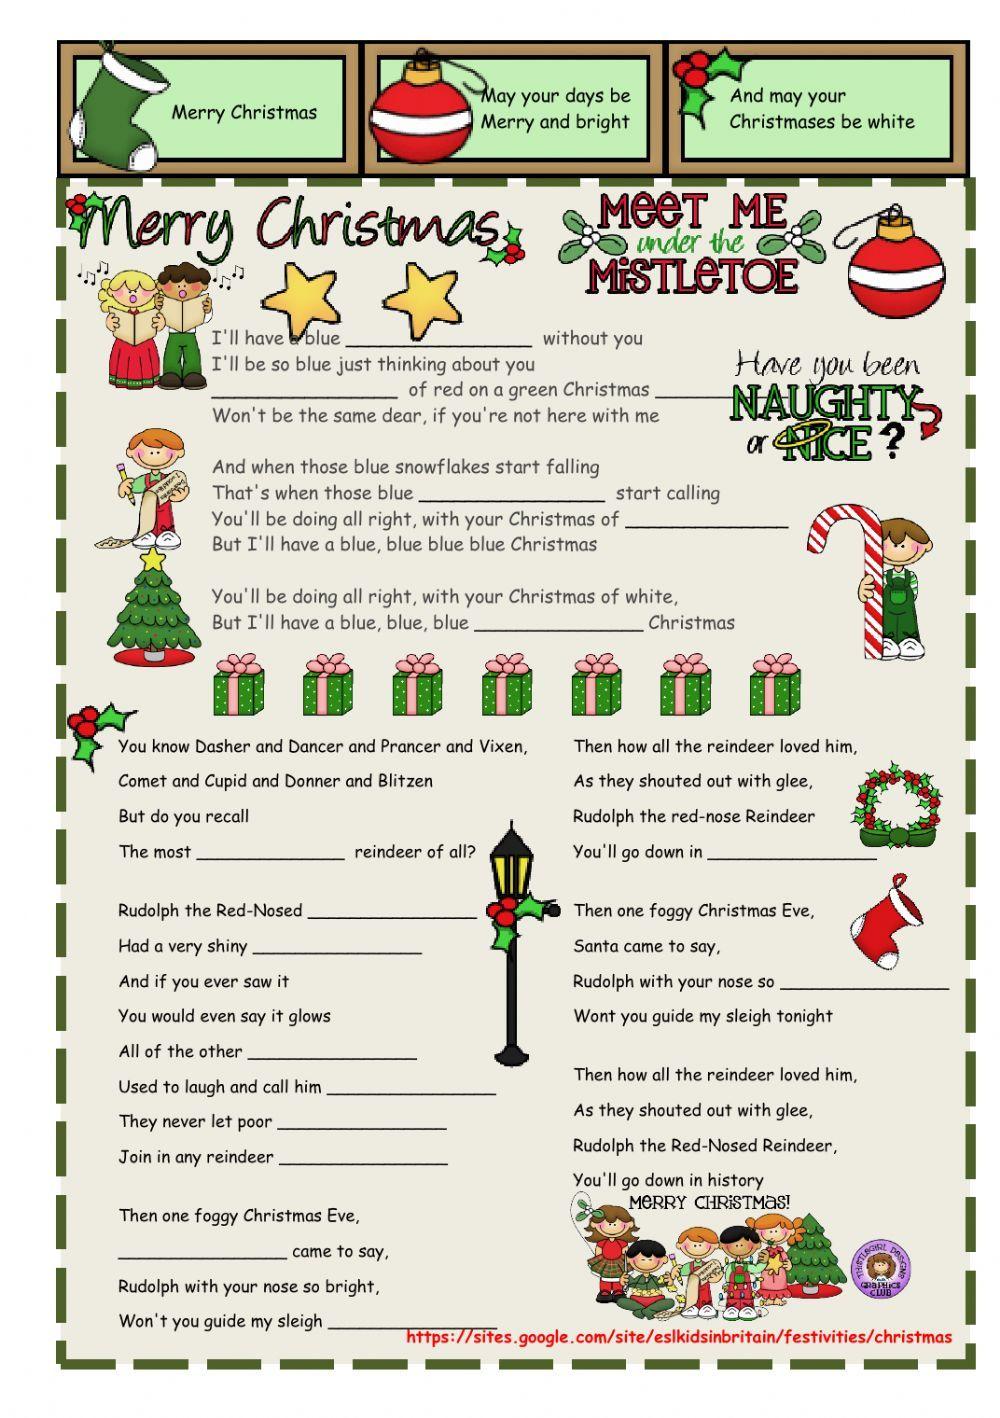 Christmas Carols - Interactive worksheet | School | Pinterest ...